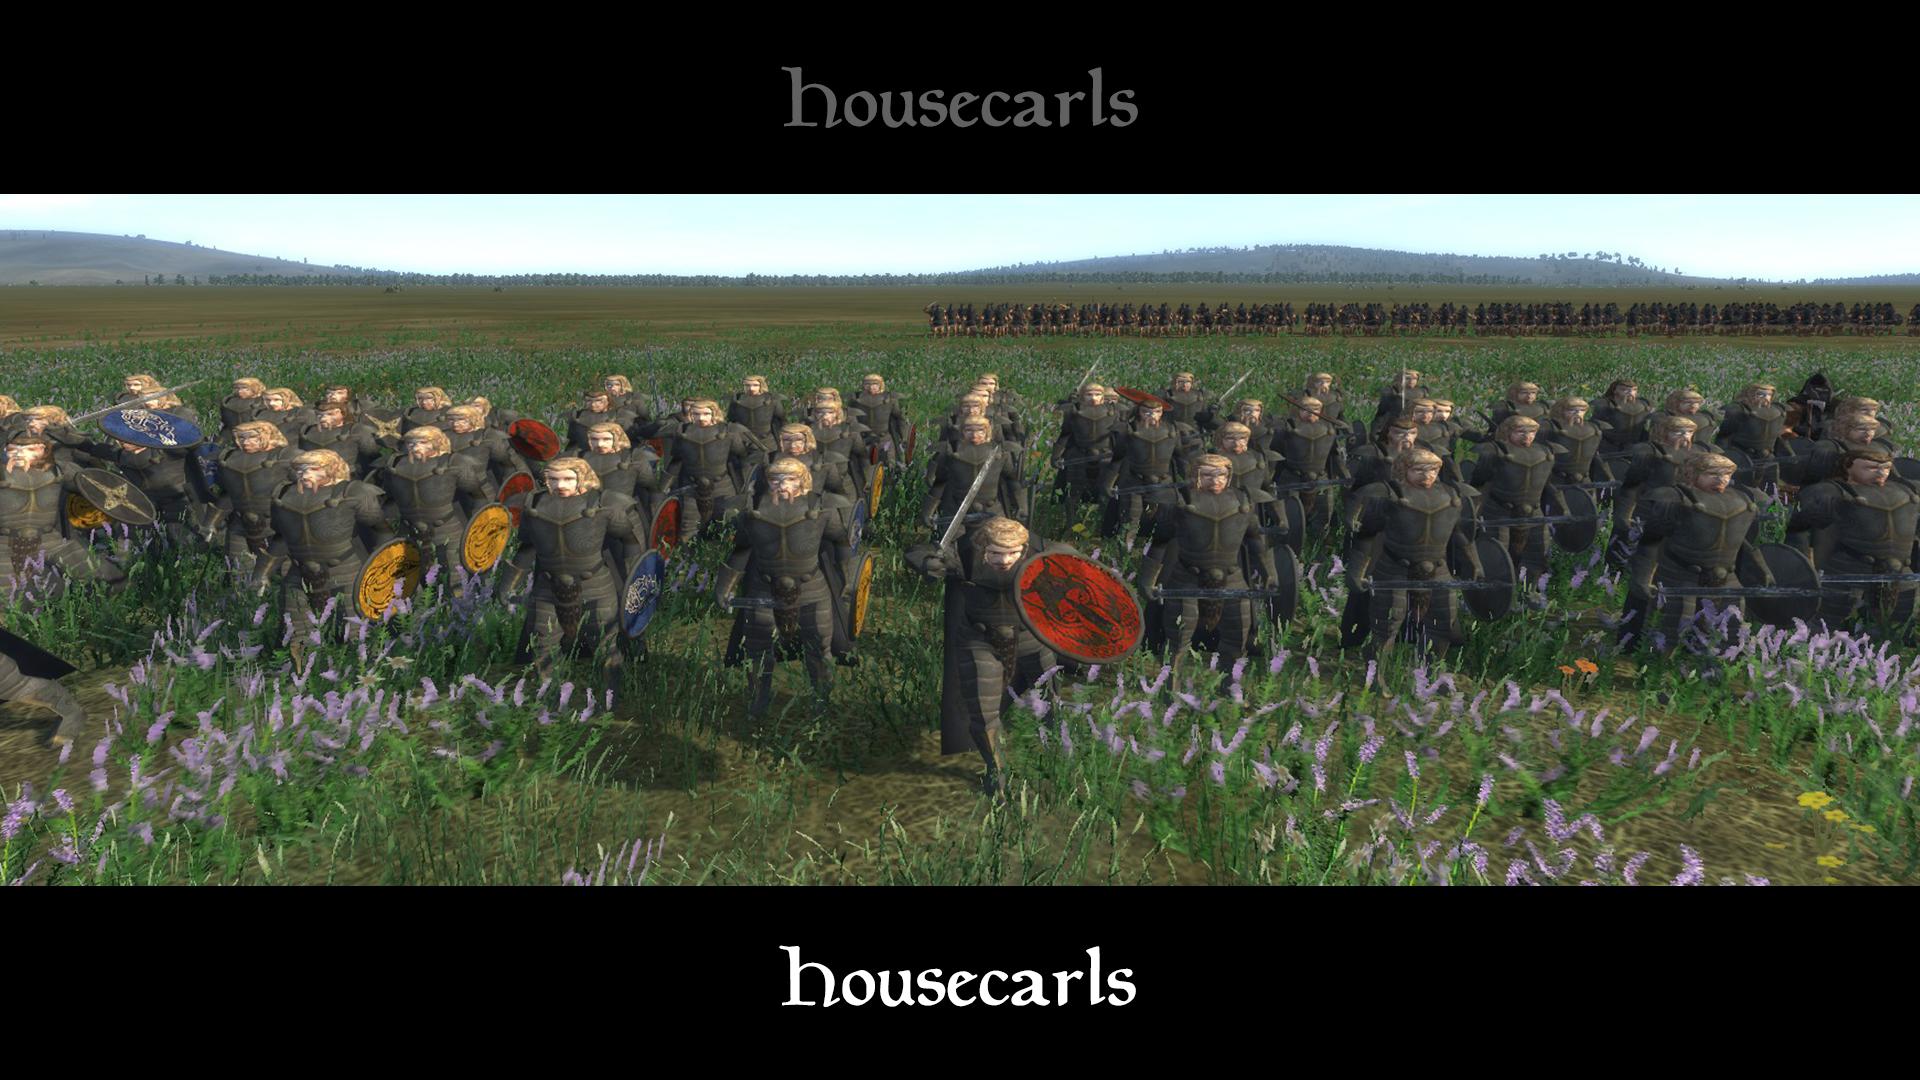 housecarls